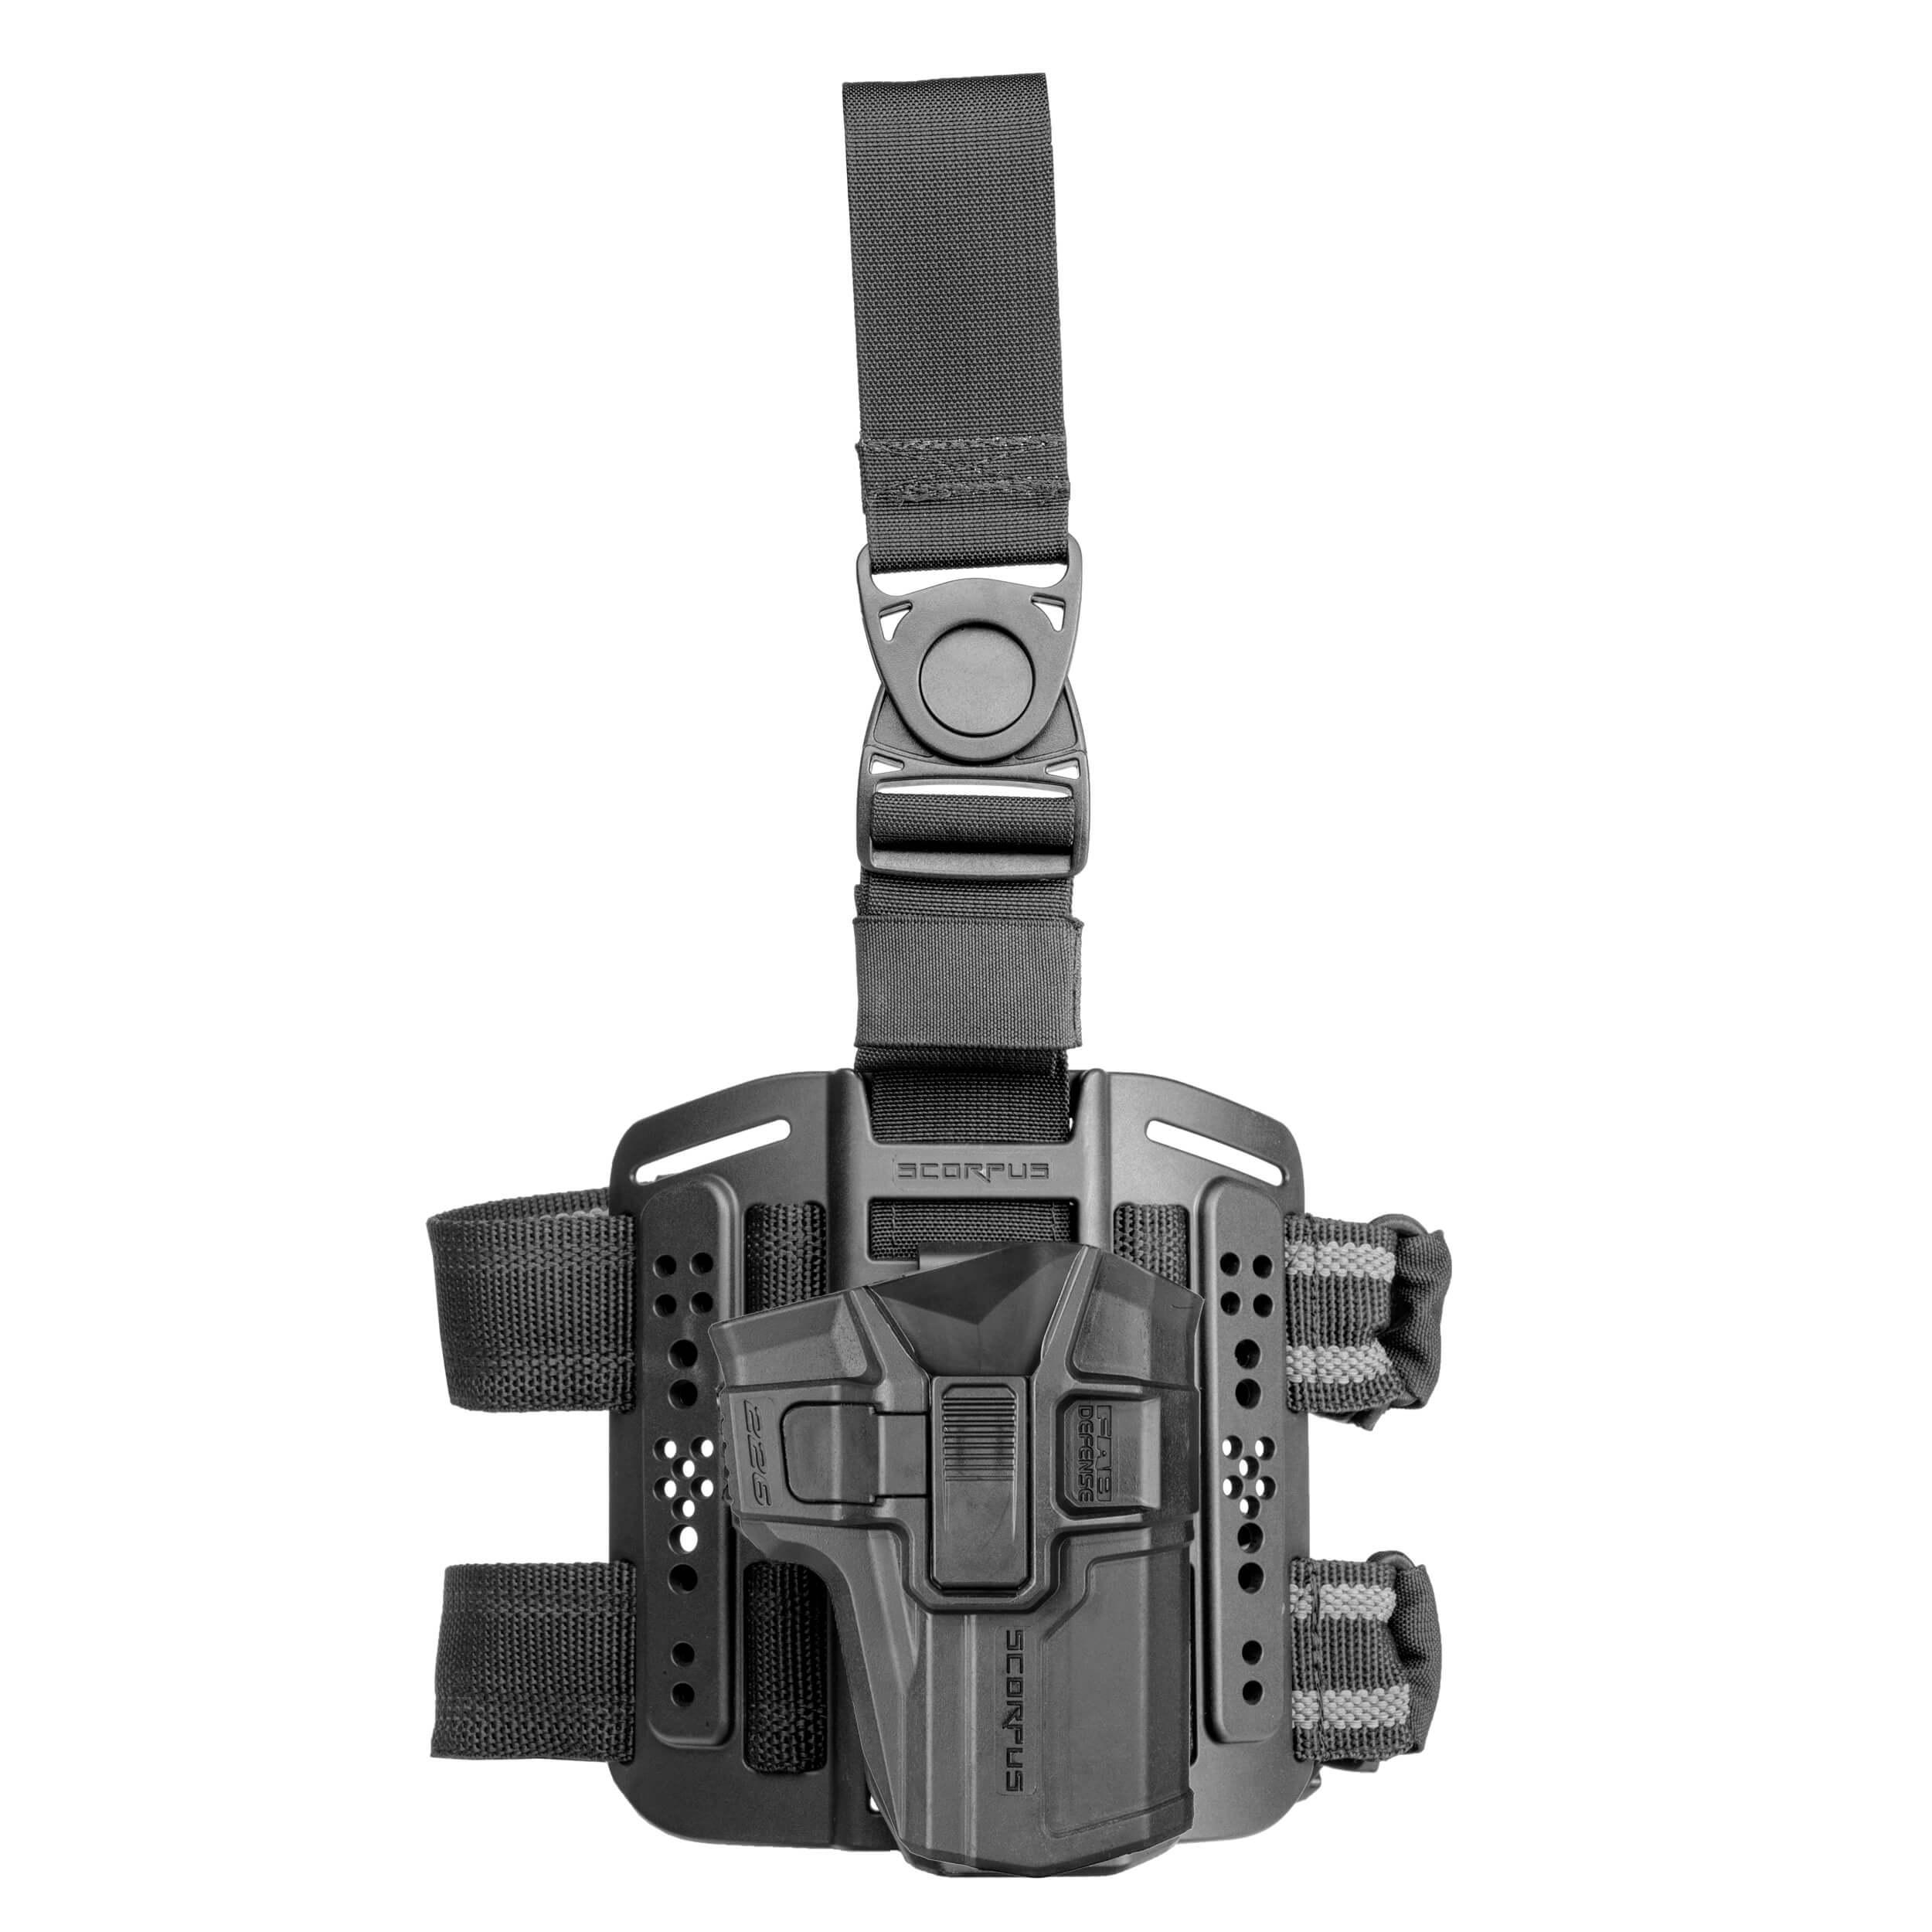 Oberschenkelholster MTR SIG Sauer P226 - LDC 2 / LDC 2 TACOPS